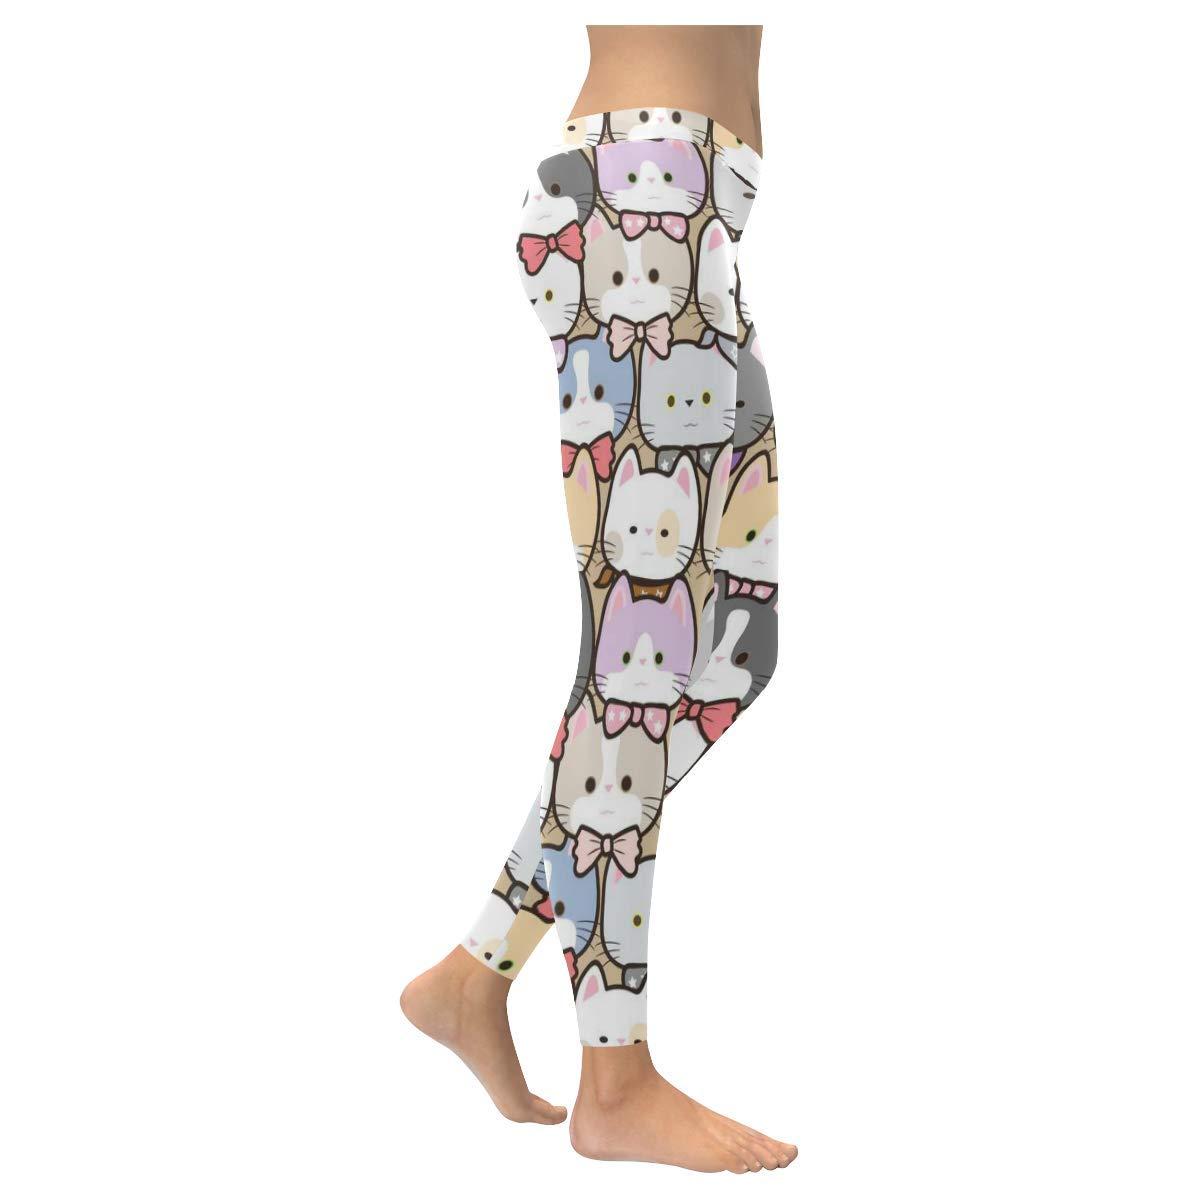 2XS-5XL InterestPrint Custom Unique Stretchy Capri Leggings Skinny Pants for Yoga Running Pilates Gym